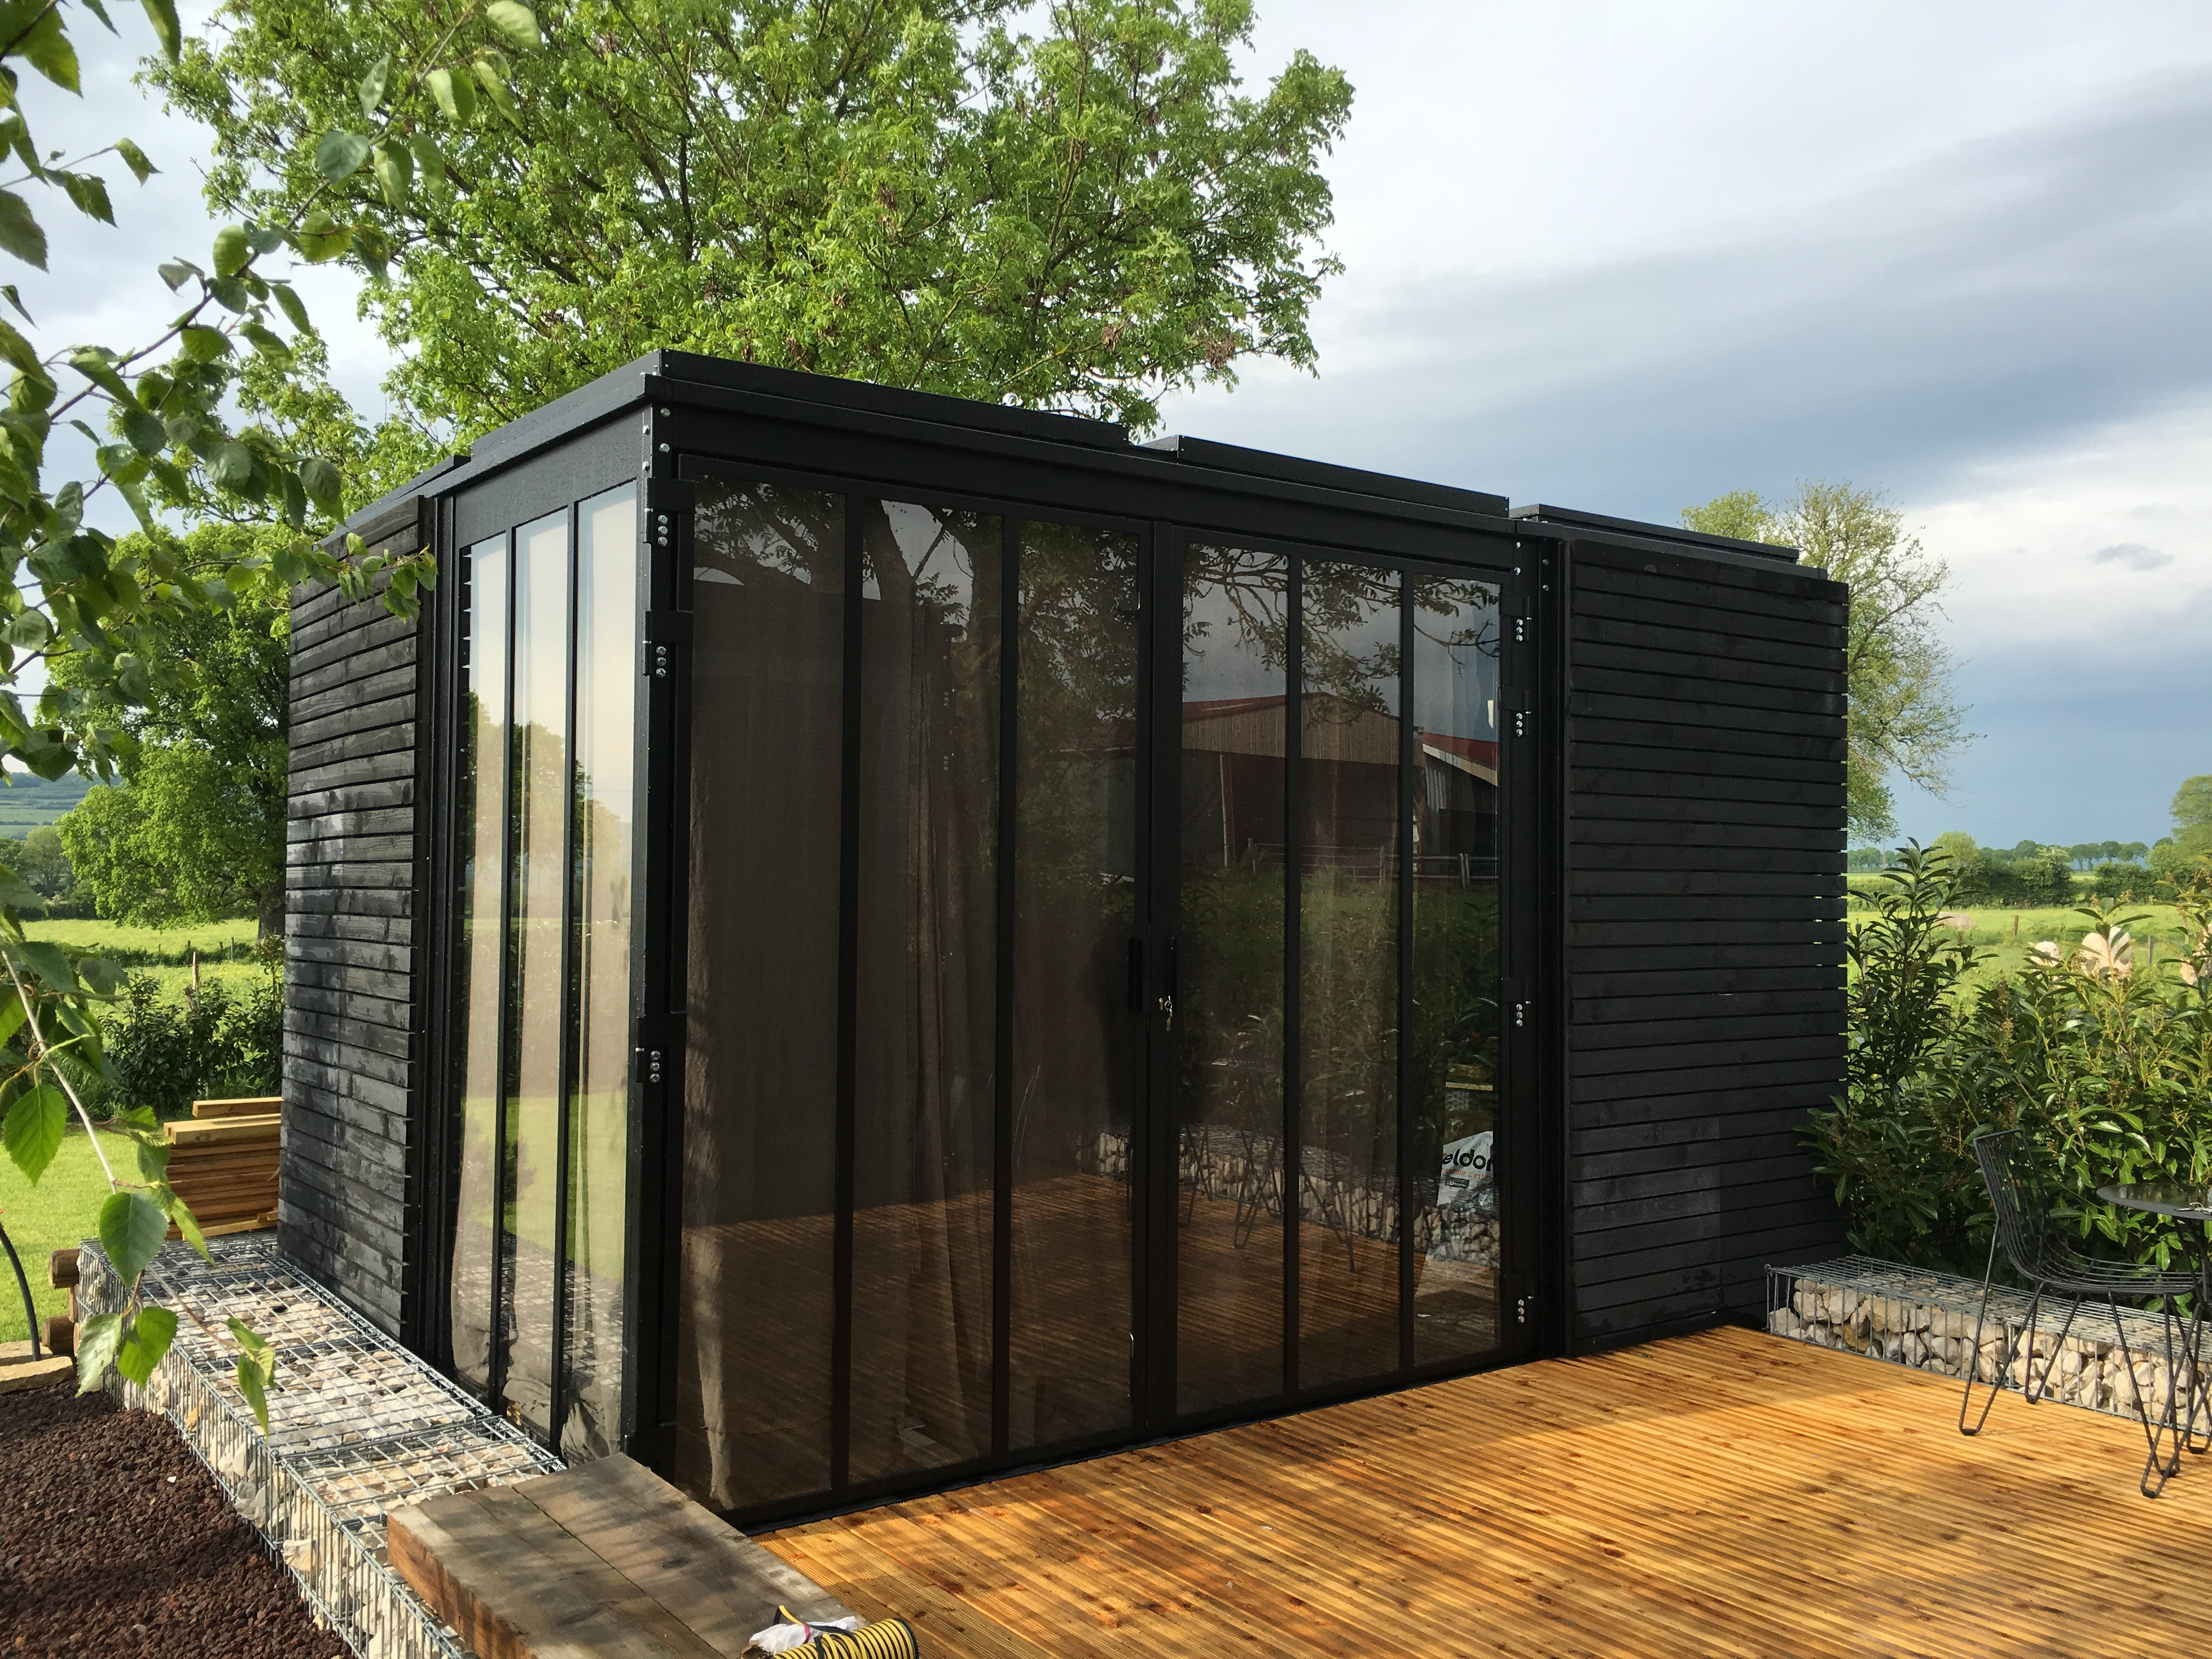 un_cube_dans_mon_jardin_-_spa_-_extensio